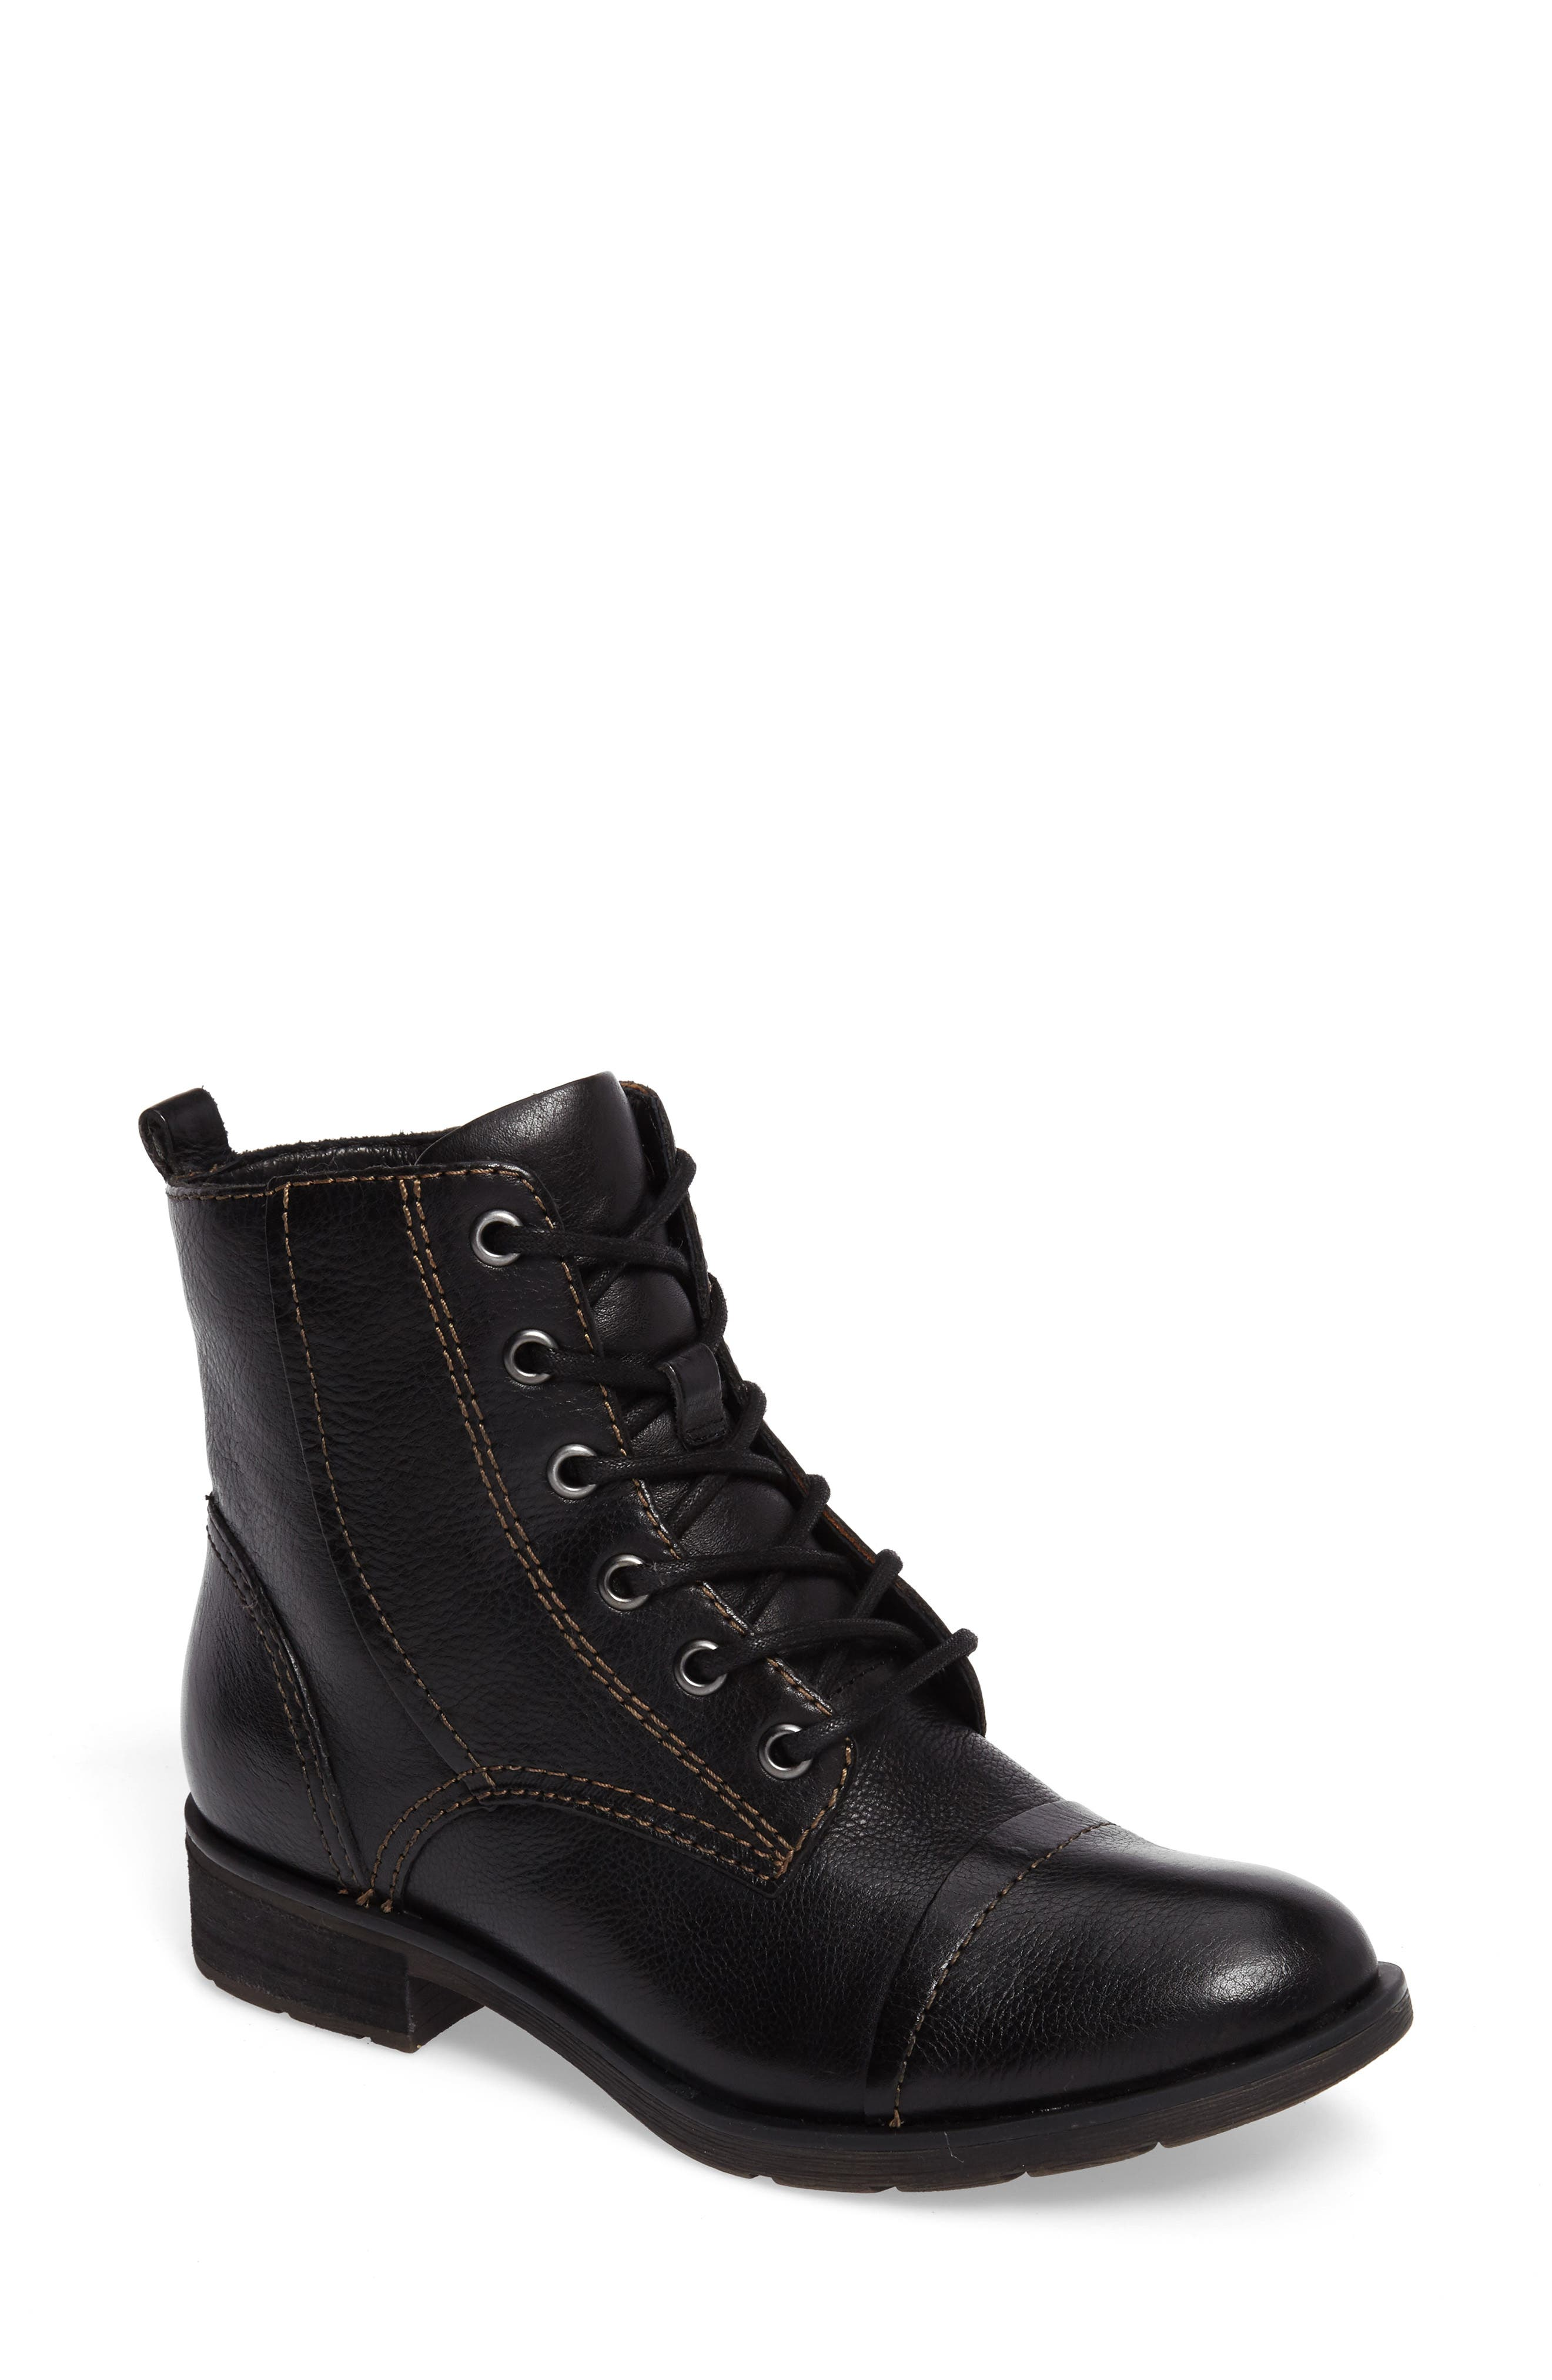 Söfft Belton Cap Toe Combat Boot (Women)